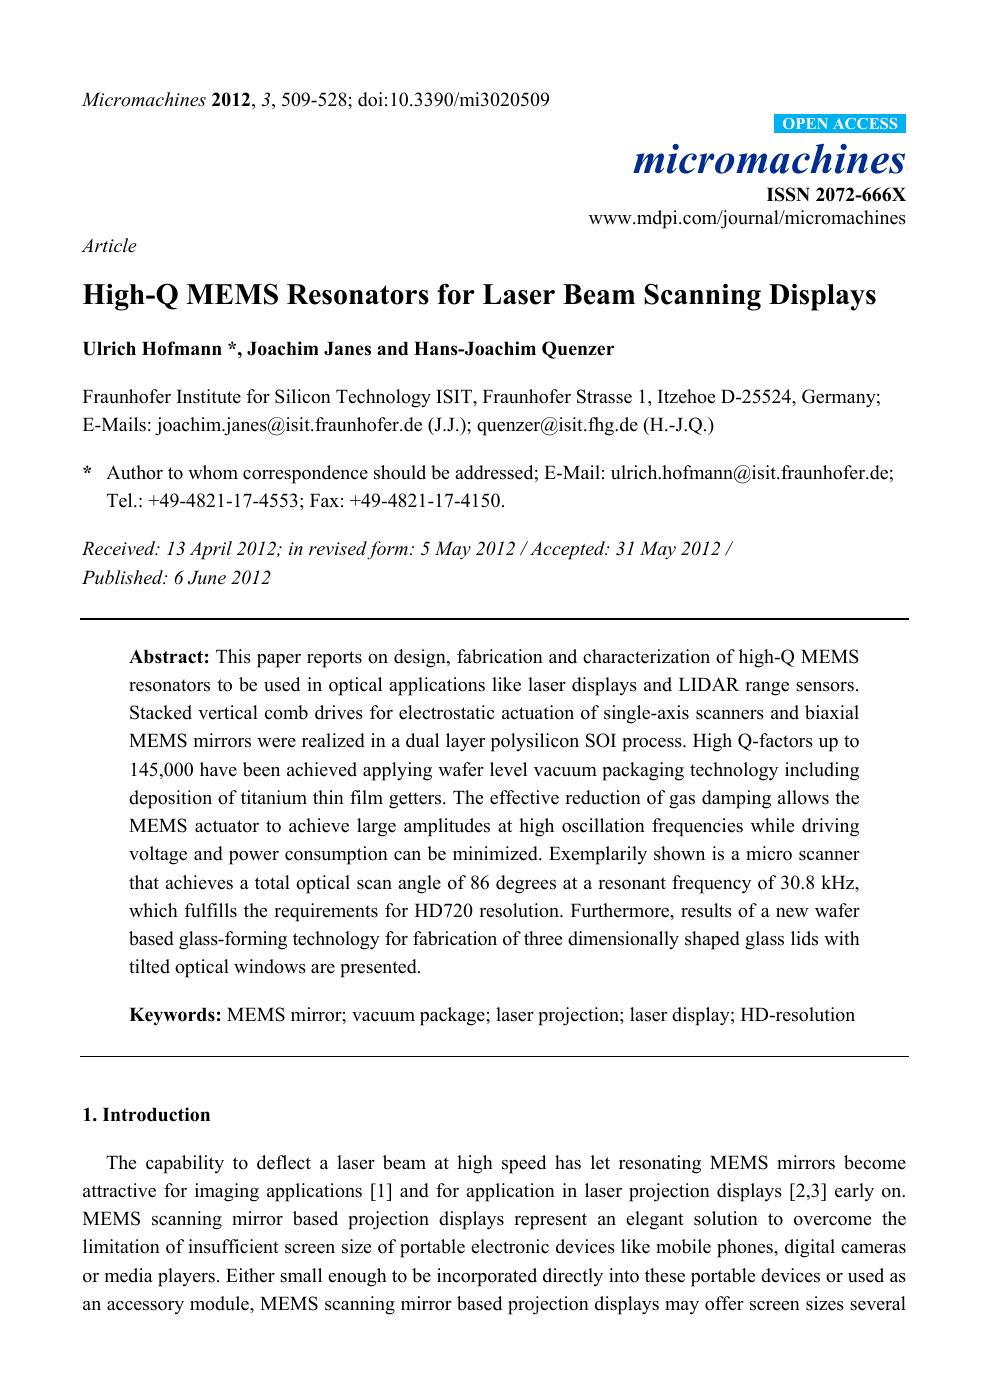 High-Q MEMS Resonators for Laser Beam Scanning Displays